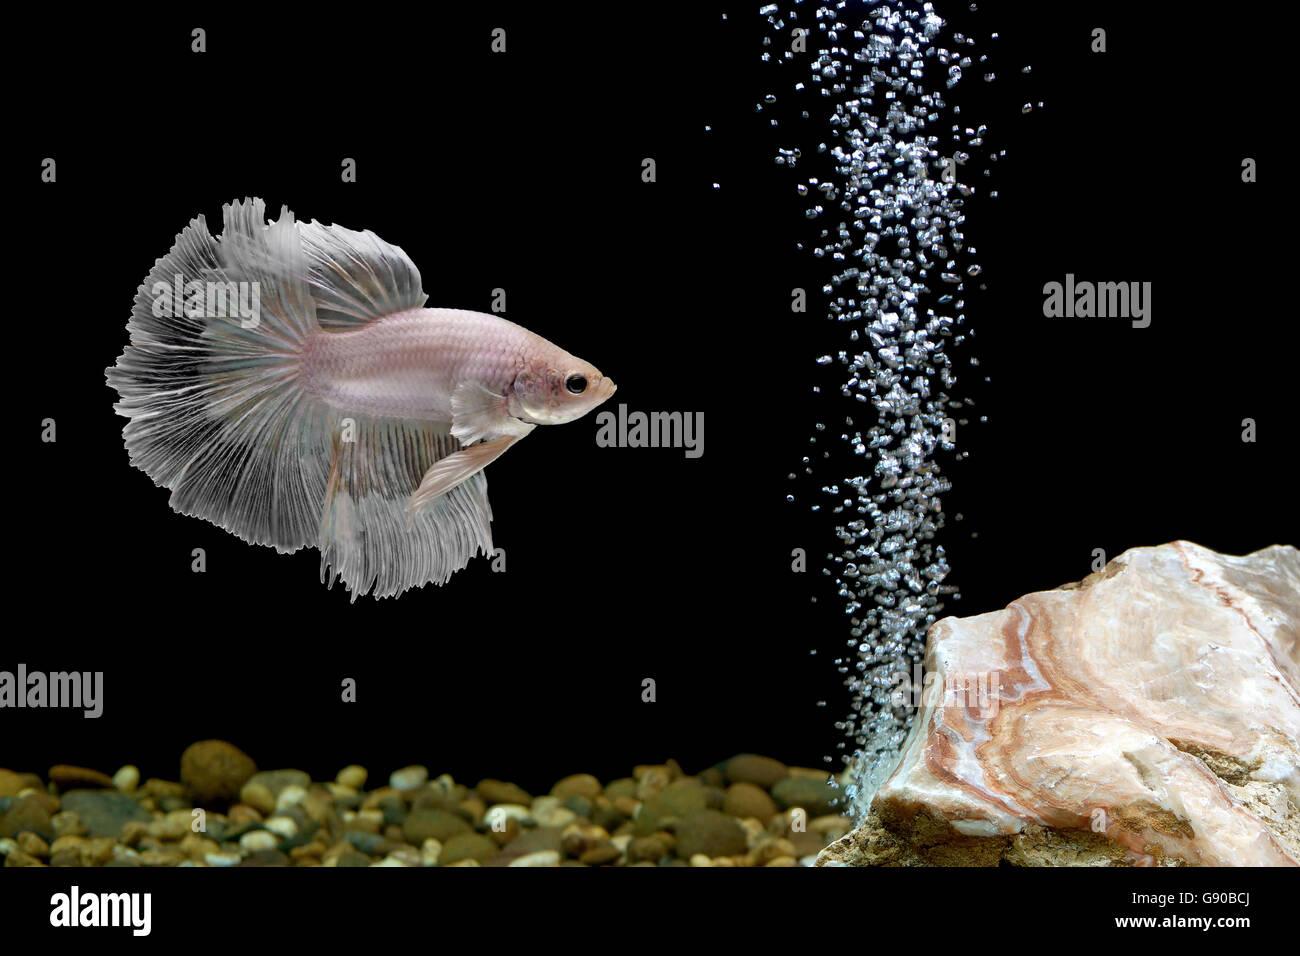 betta fish, siamese fighting fish in fishbowl - Stock Image